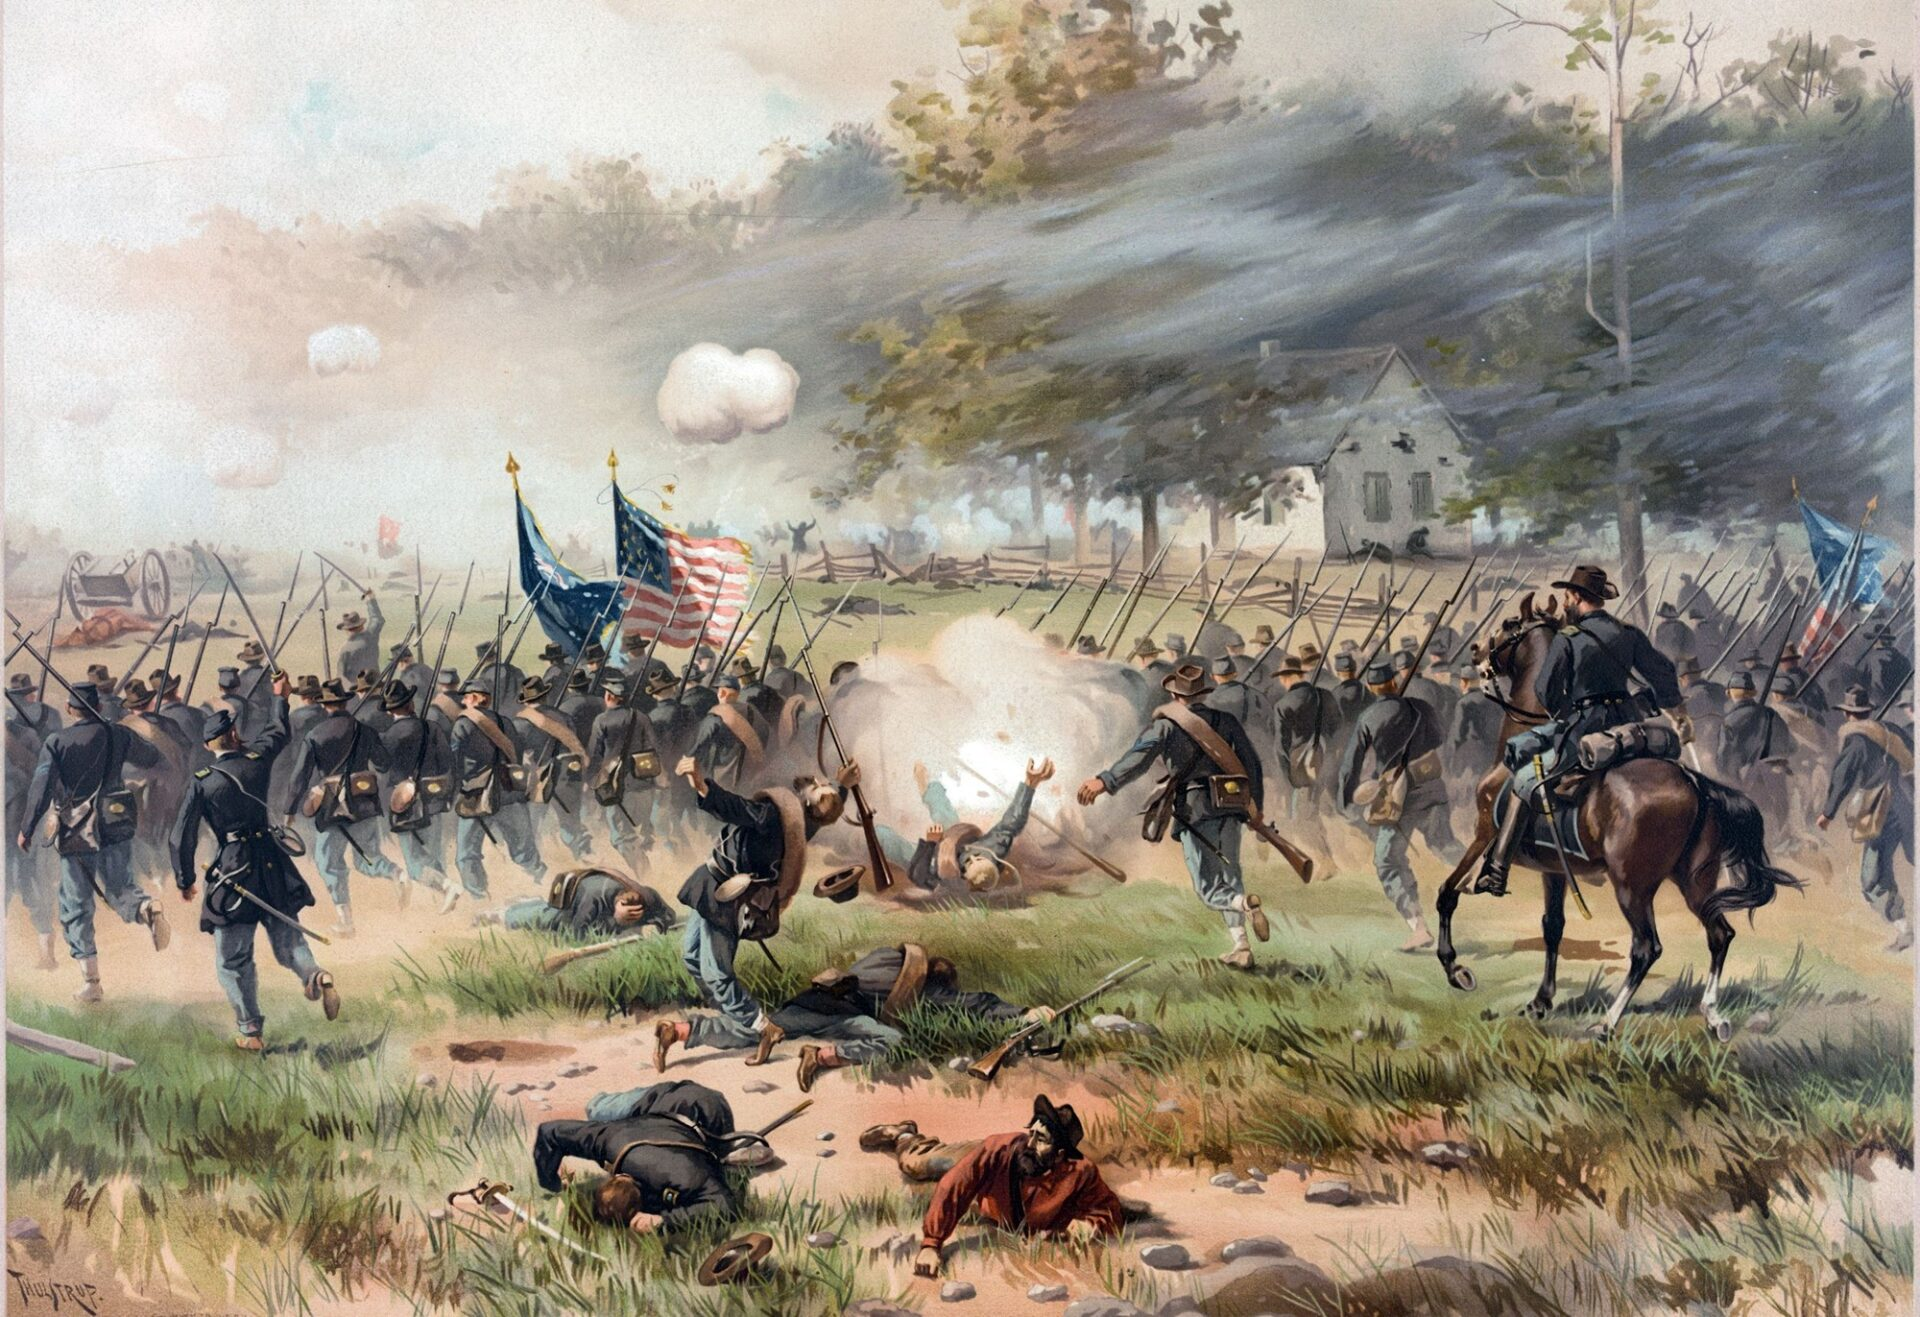 Reasons for the American Civil War In Short